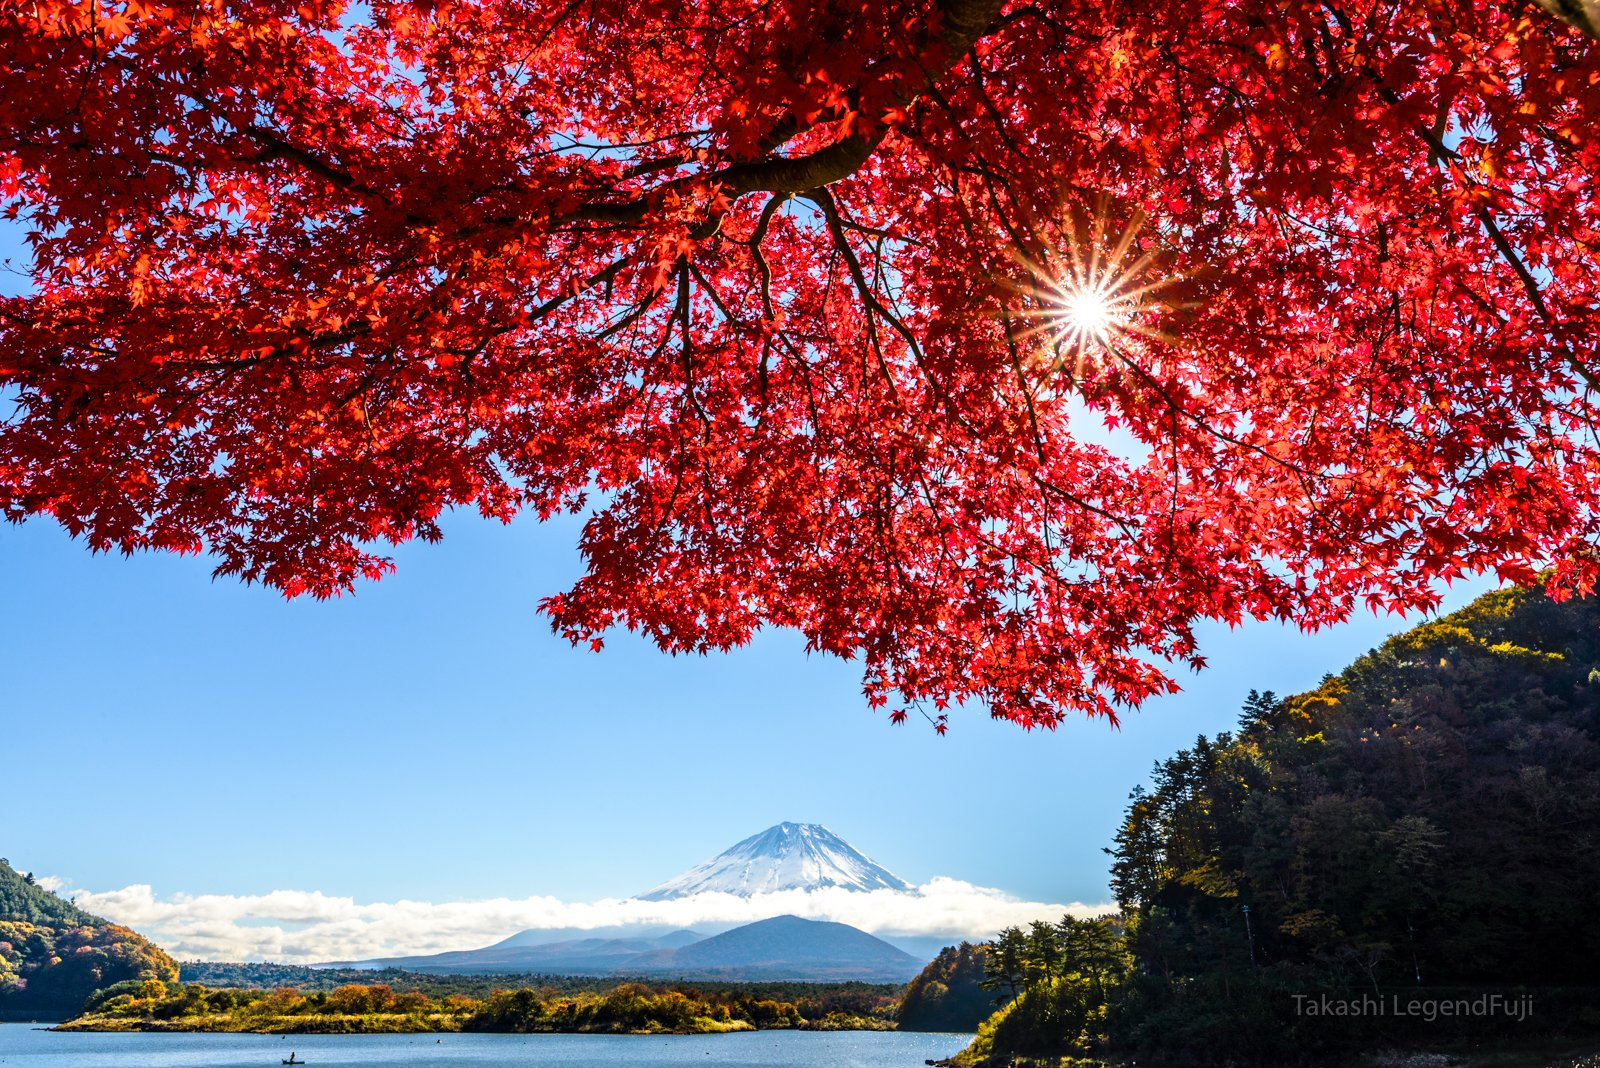 Fuji,mountain,Japan,lake,water,sky,blue,red,leave,autumn,tree,sun,cloud, Takashi